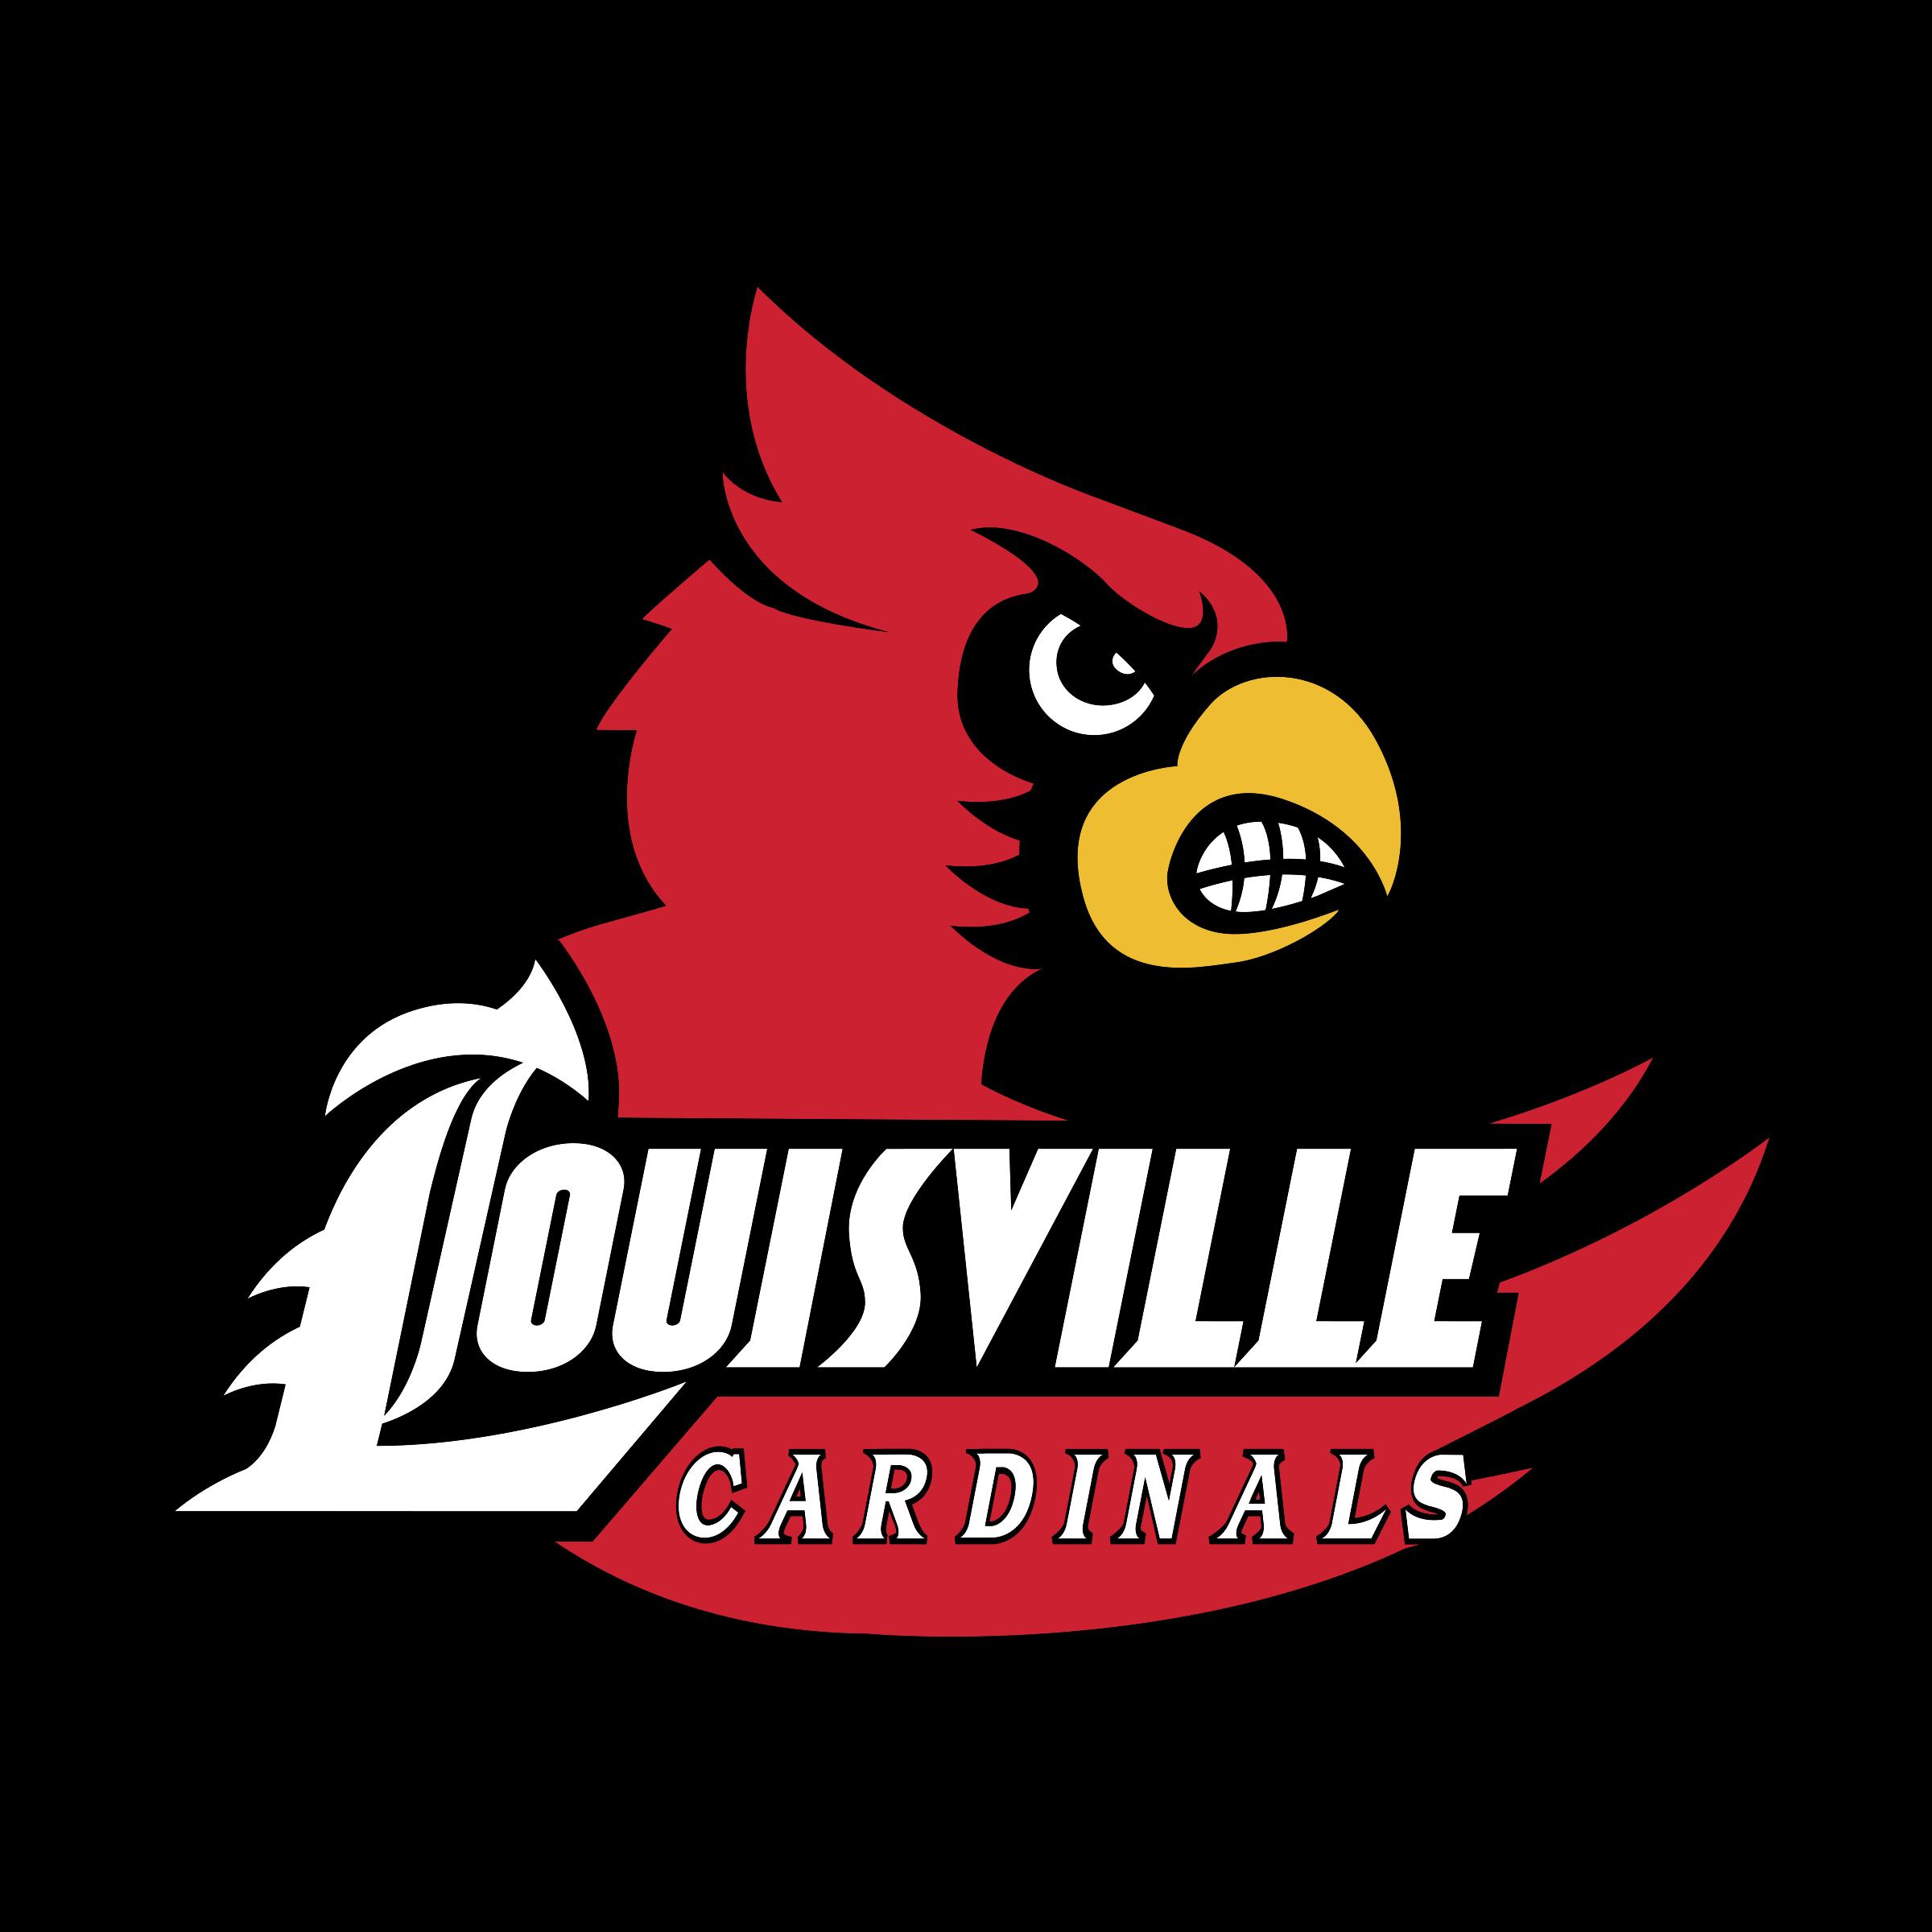 cardinal louisville.png